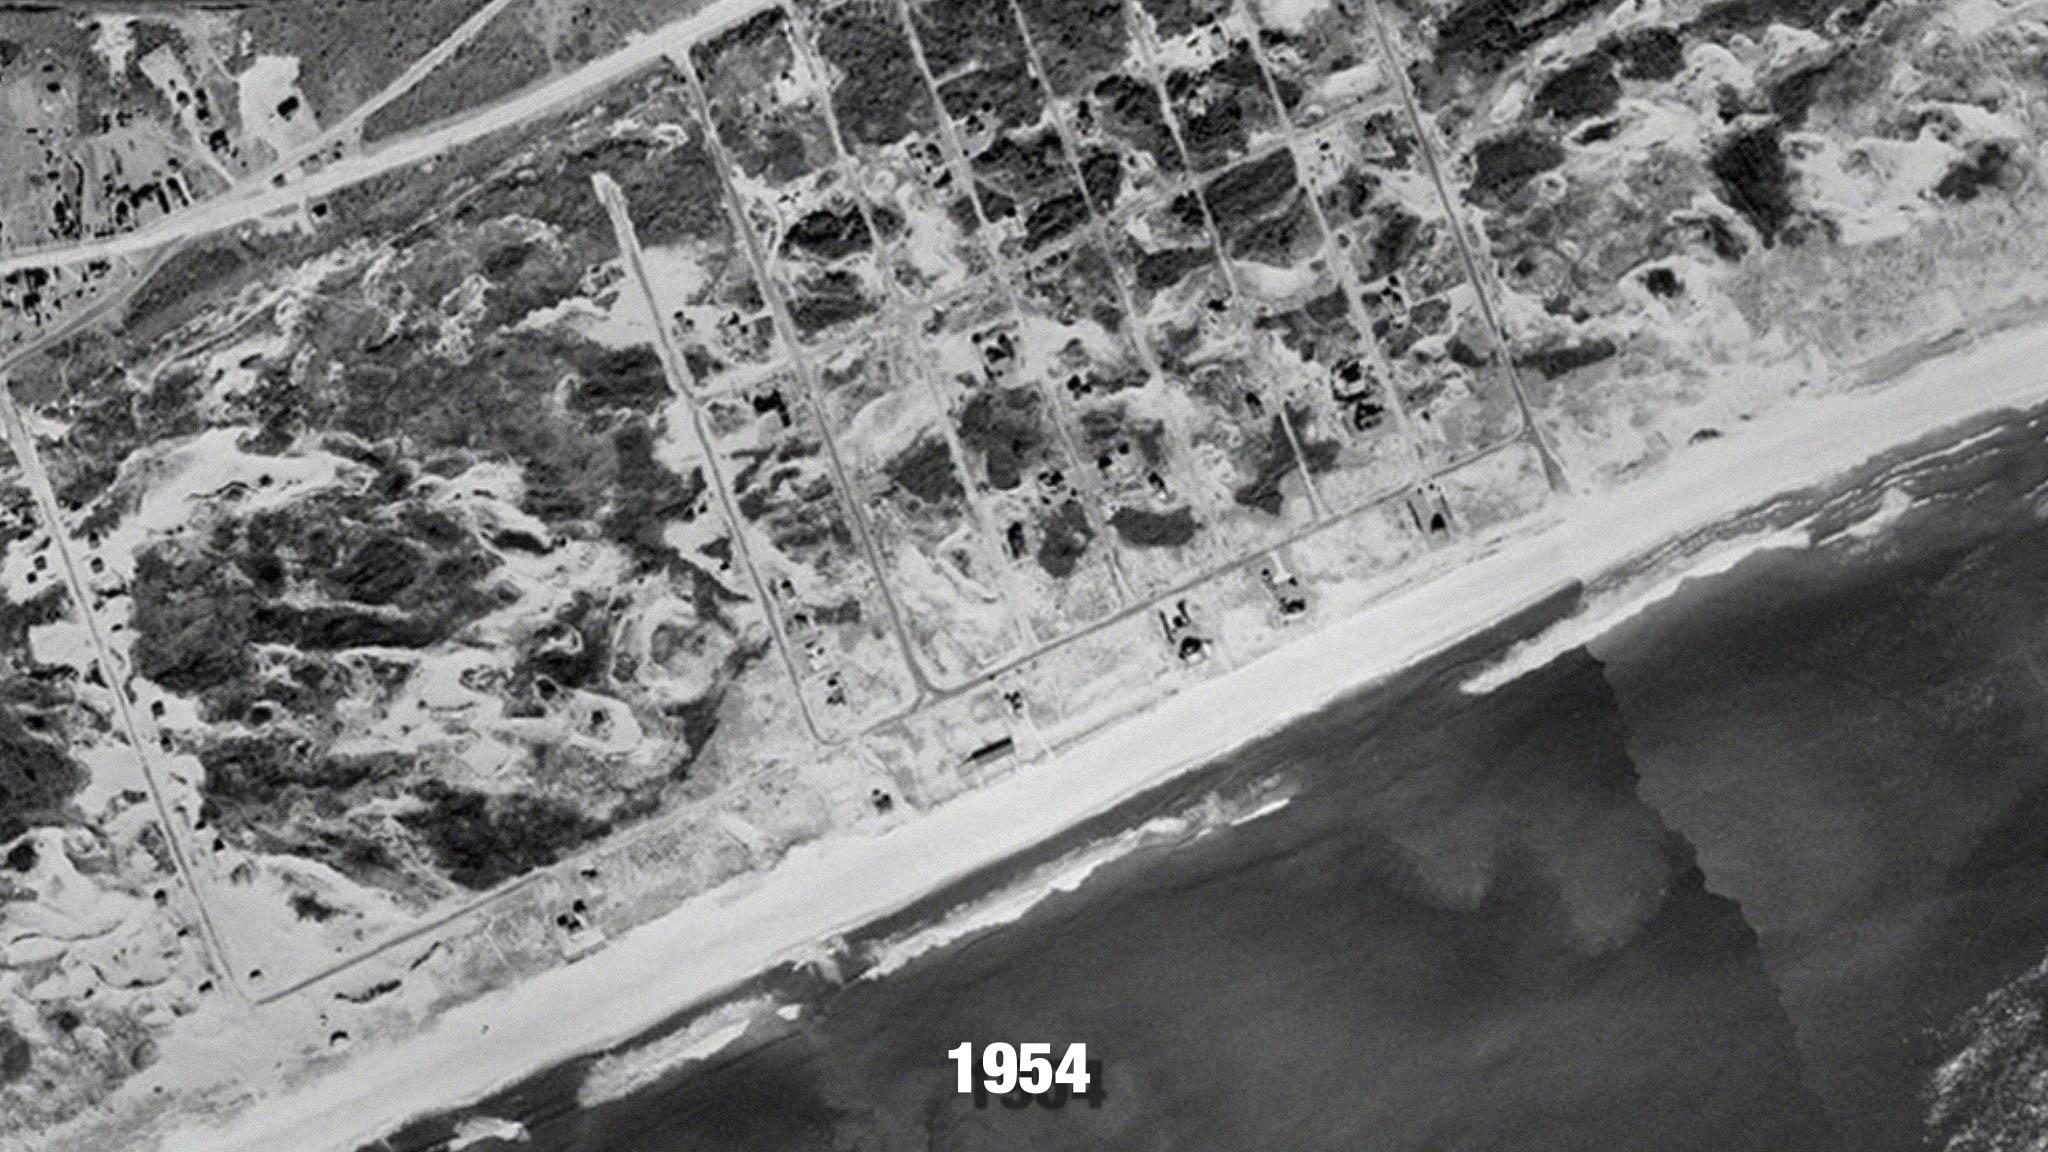 C_OBH_Hamptons_Satellite_2k_Static_01_Before_Year.jpg